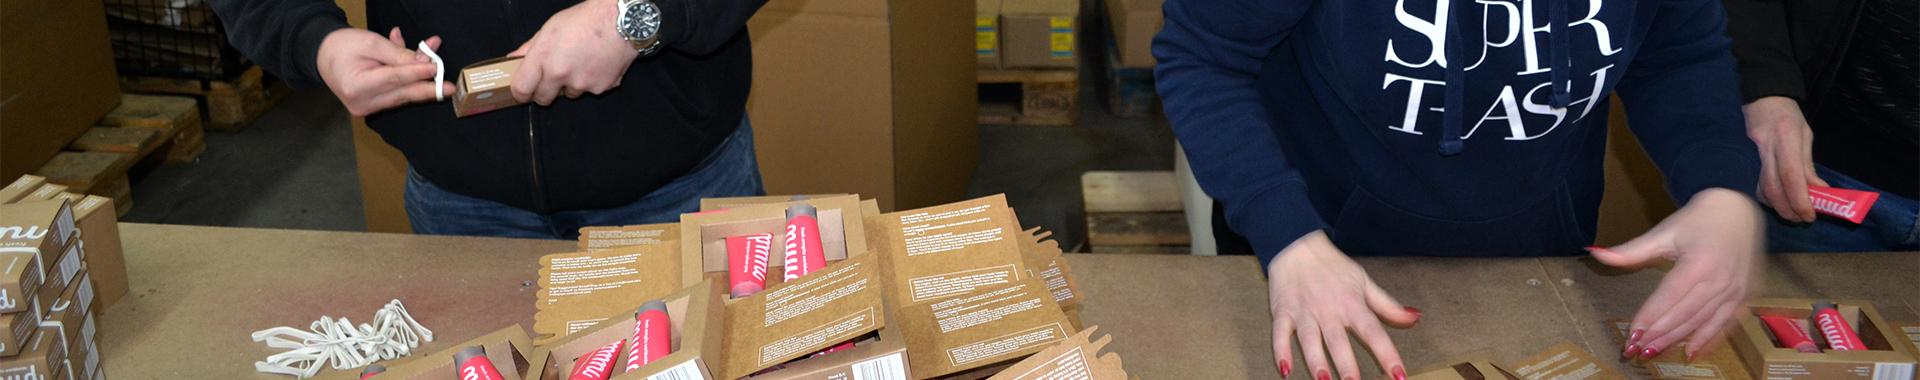 Handmatig ompakken